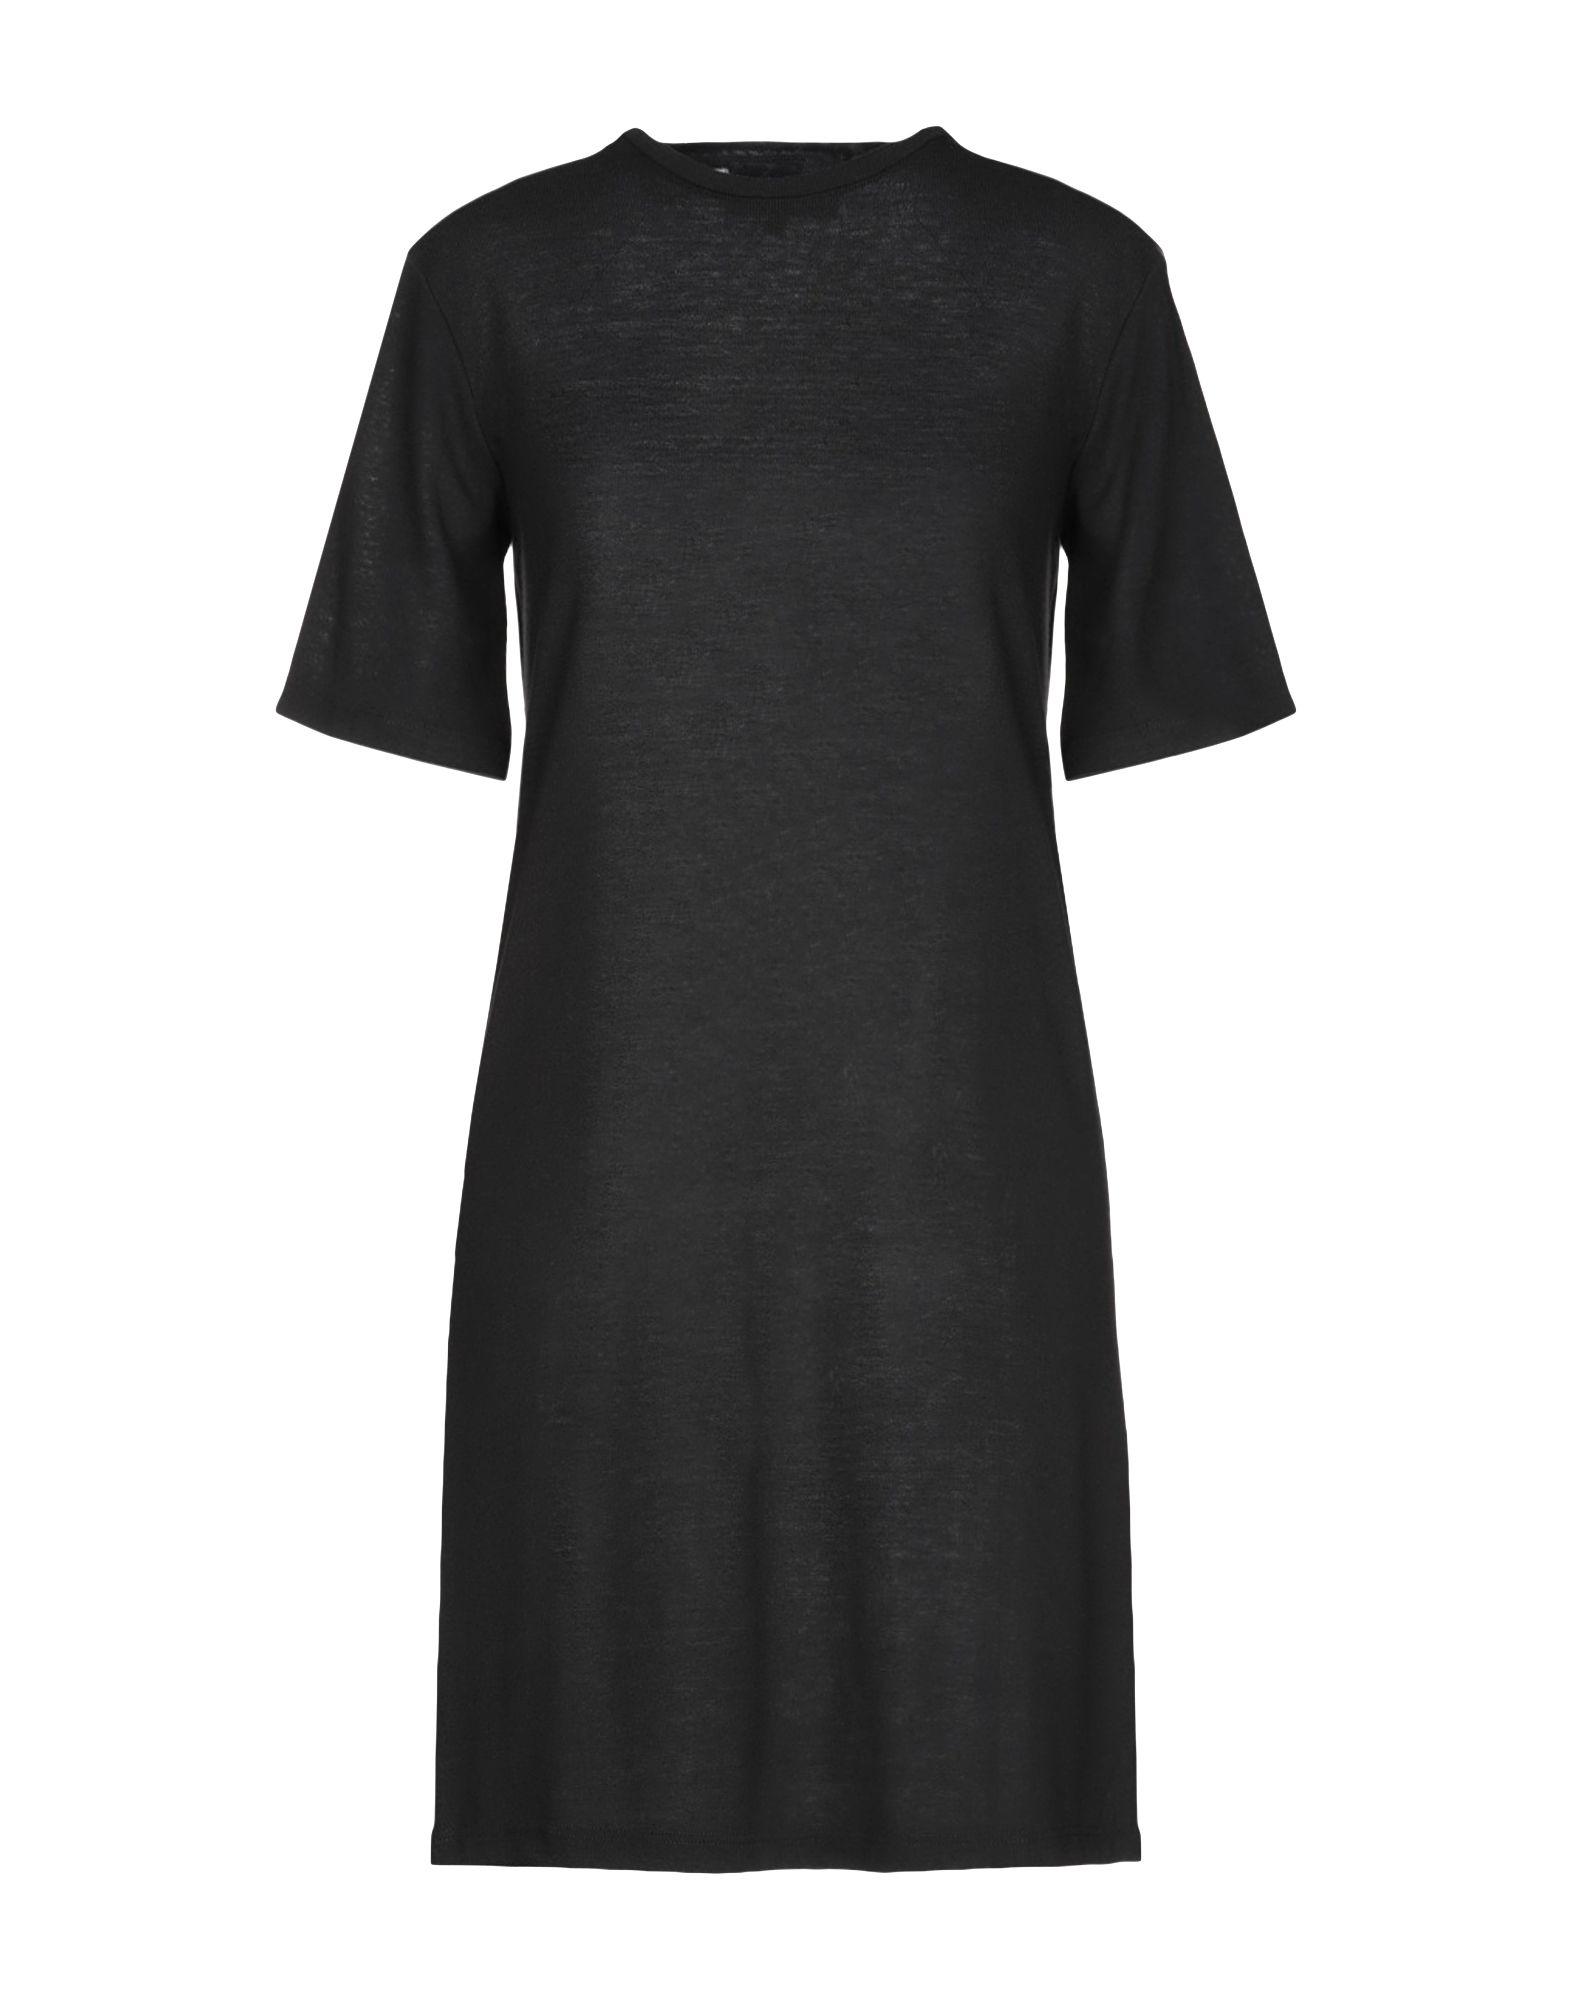 Numero 00 Short Dress In Black